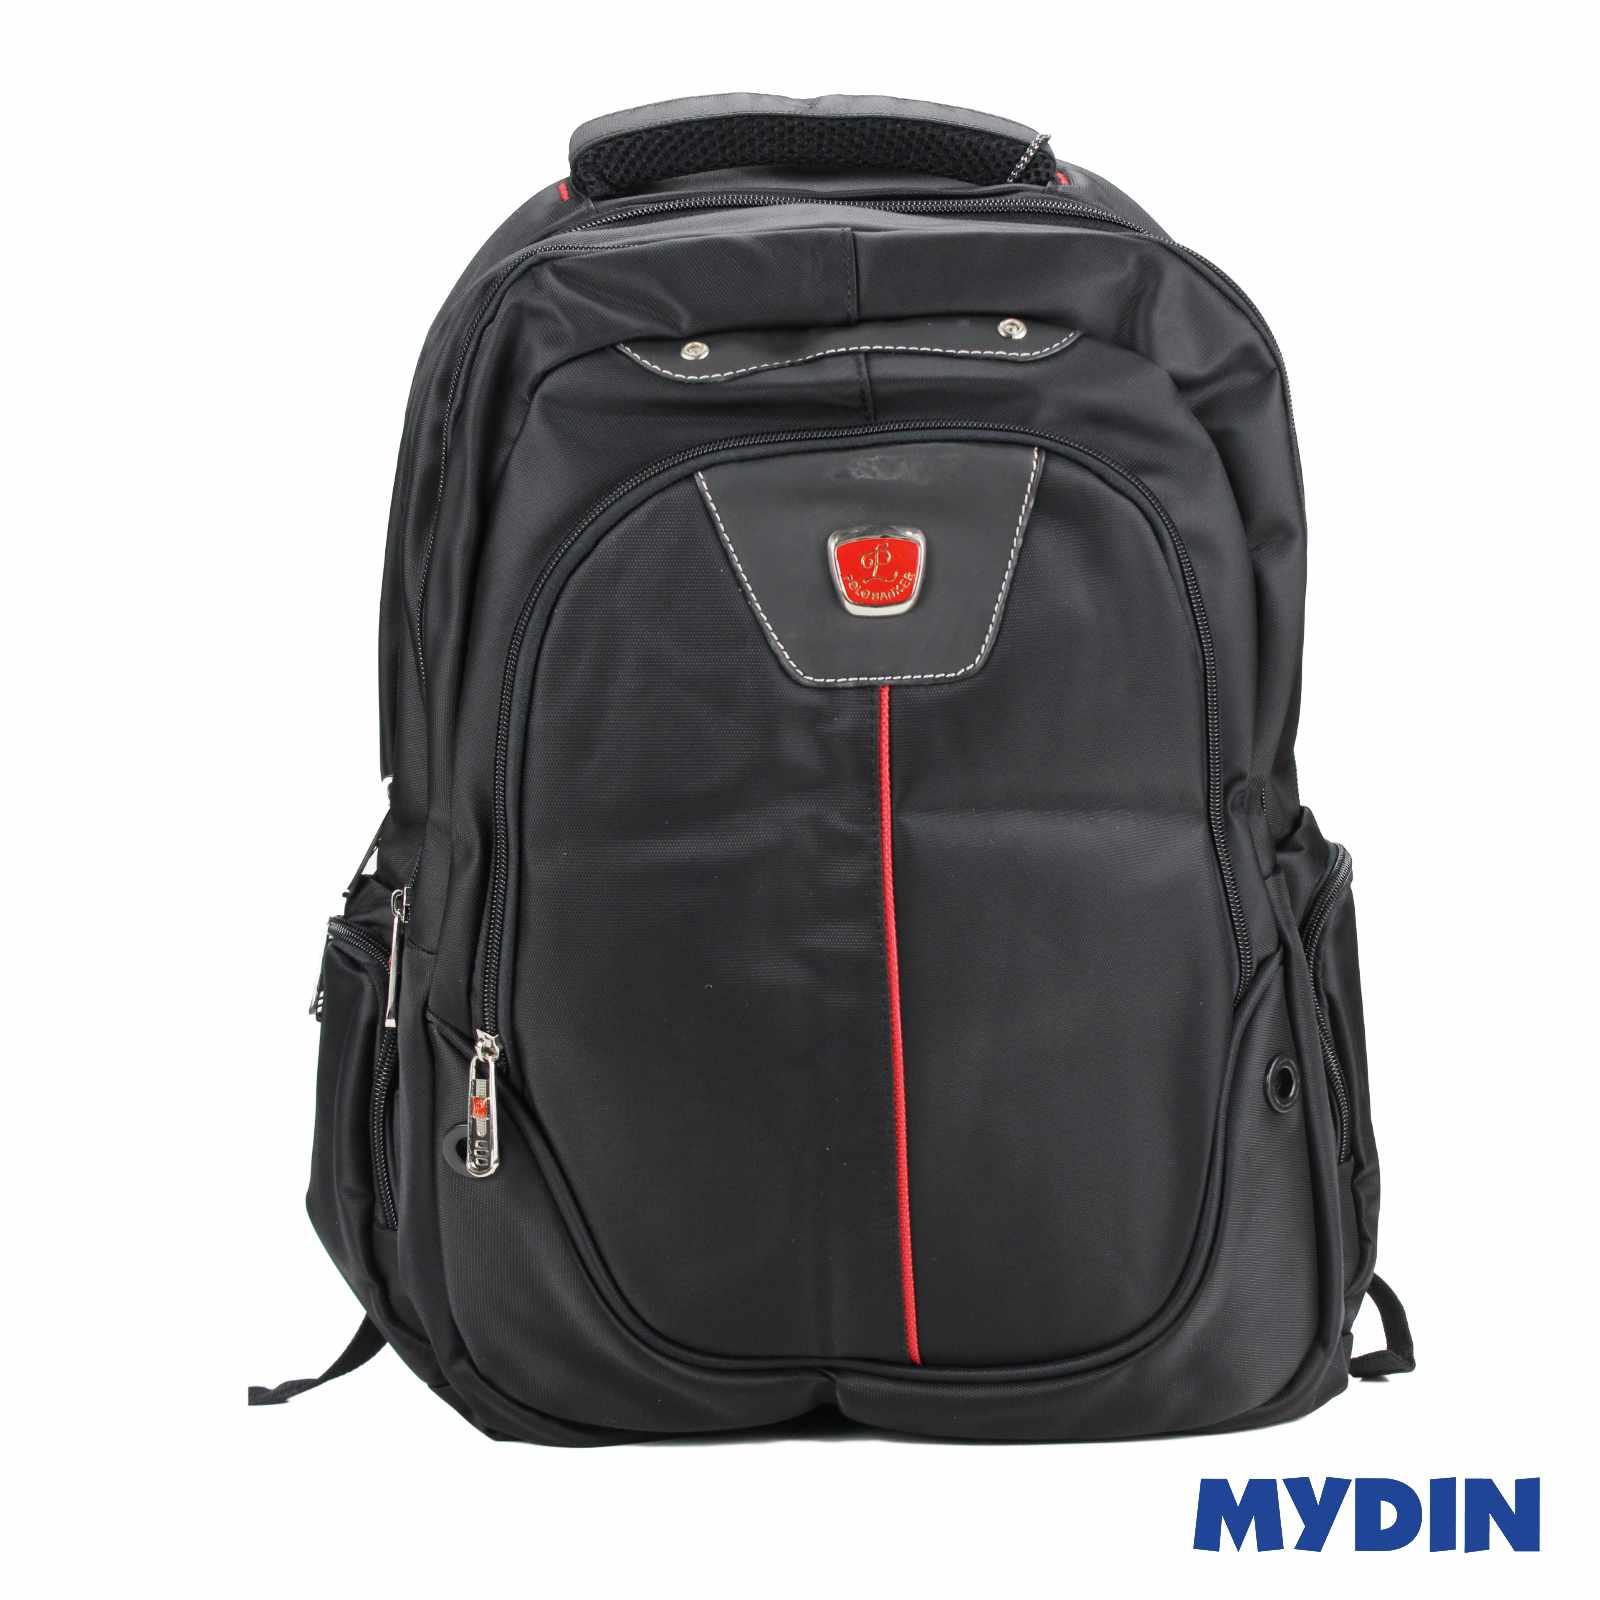 Polo Banker Laptop Haversack Bag 1C E46LB (Black Red)